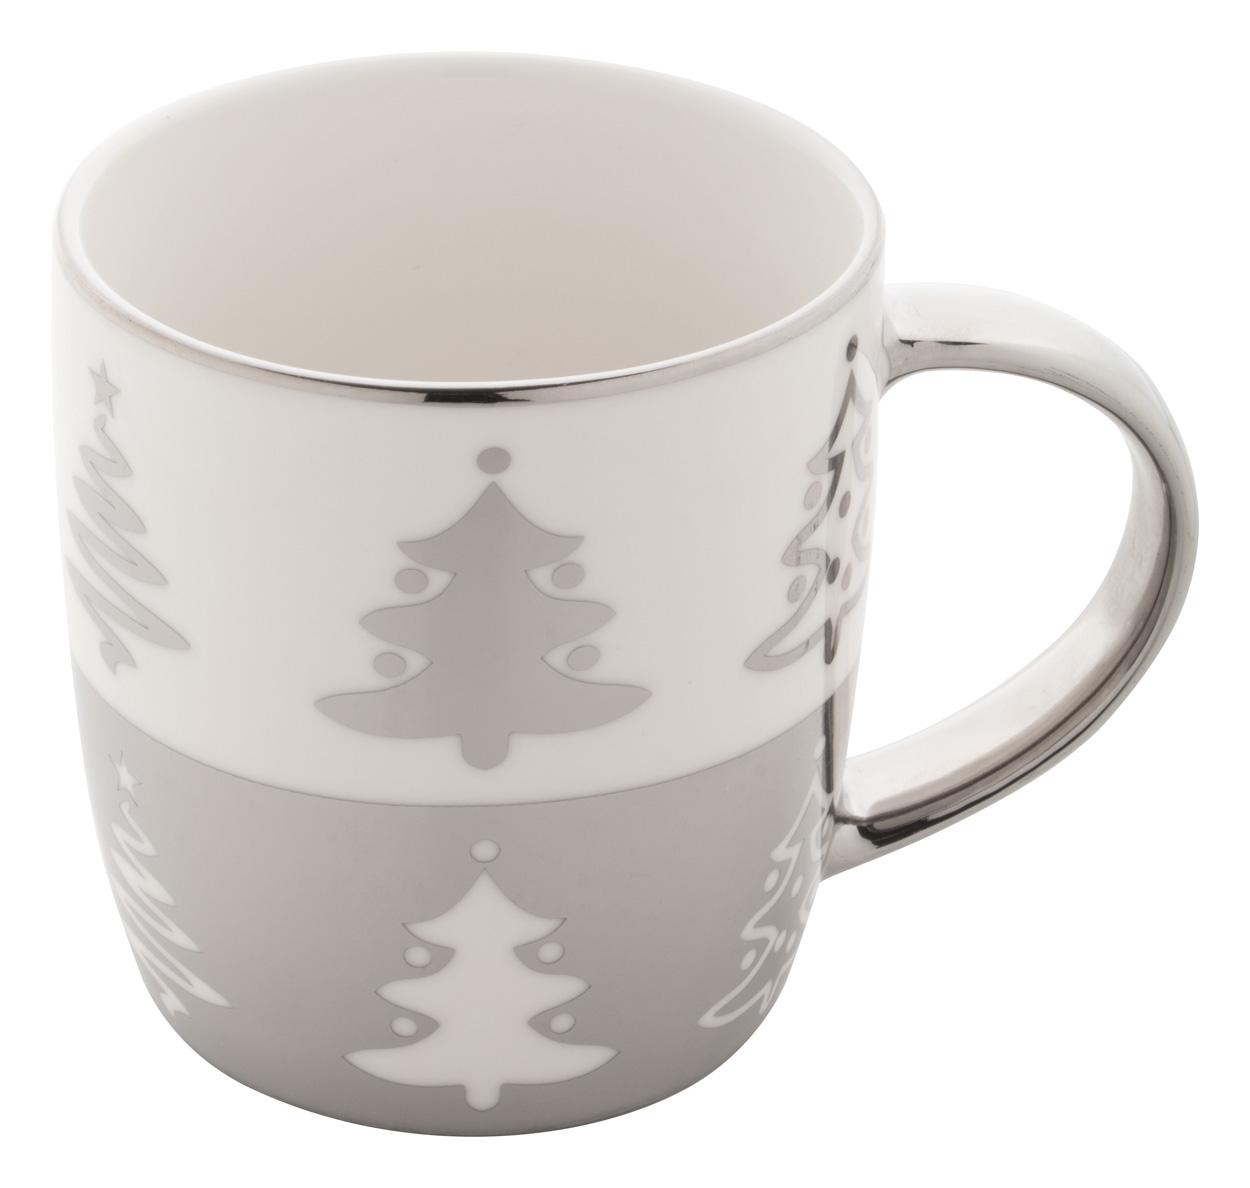 Proxxy Christmas mug